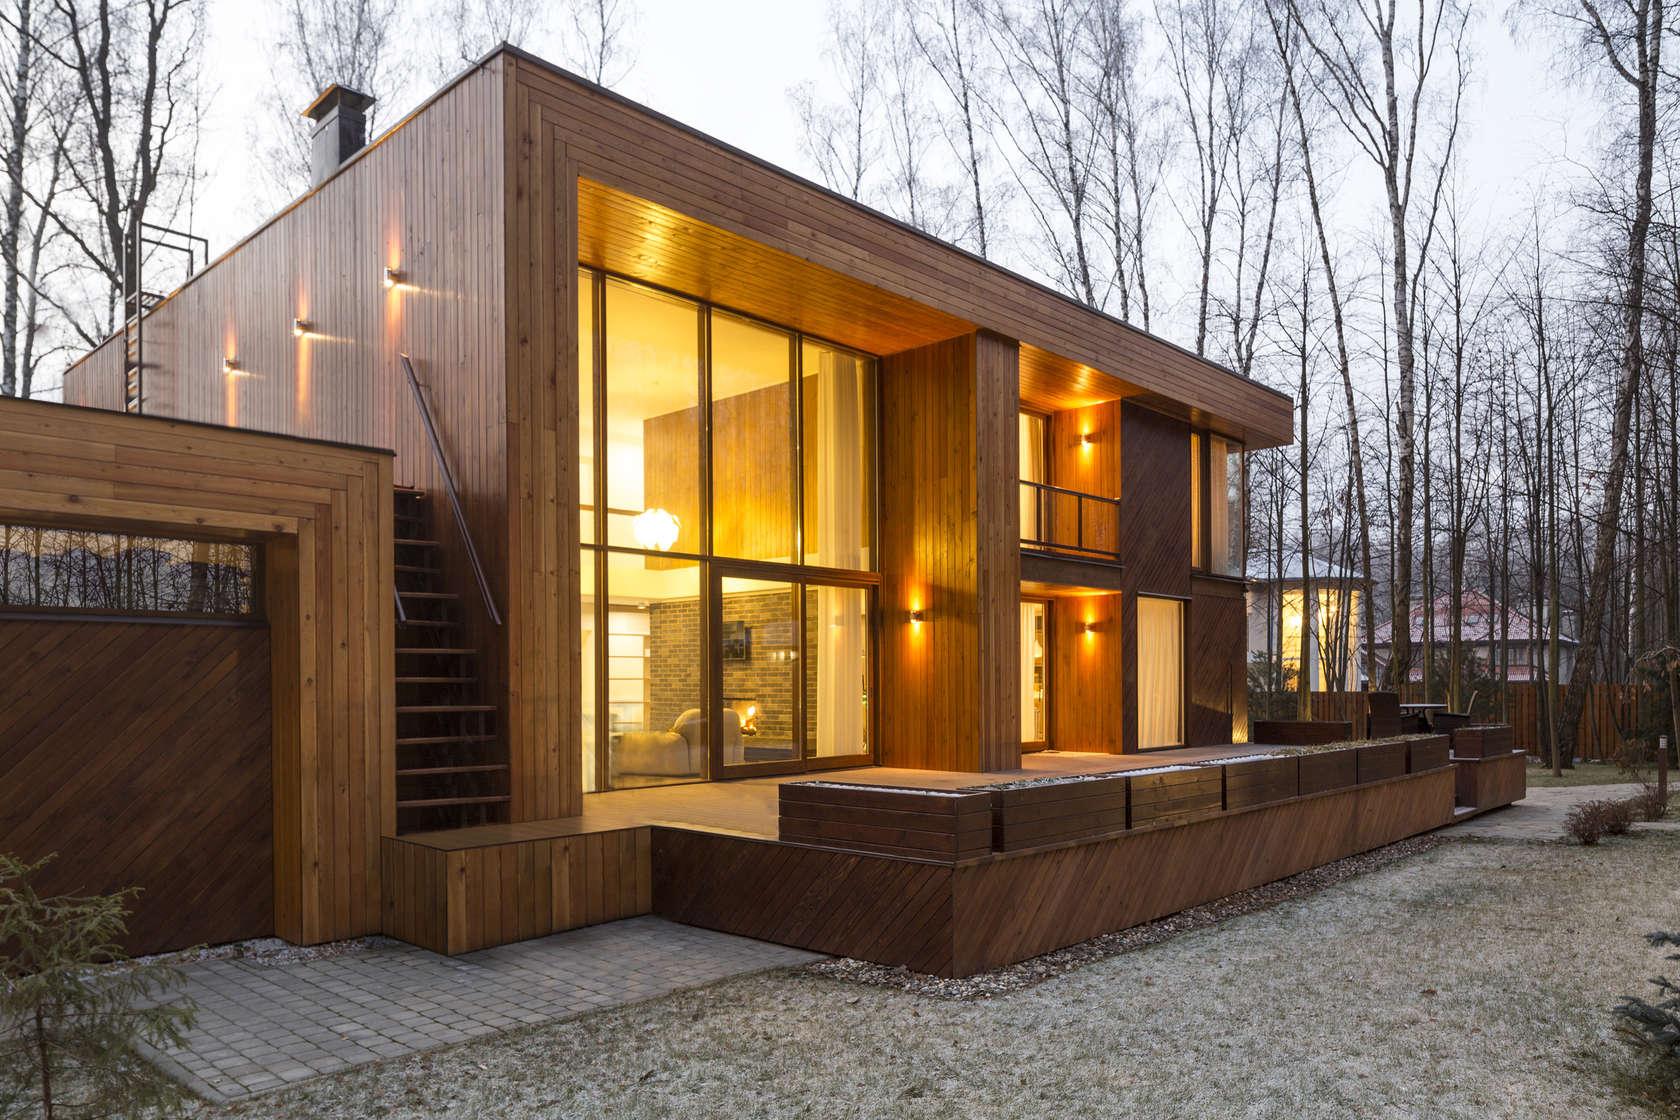 Diseño de casa de madera de dos pisos | Construye Hogar